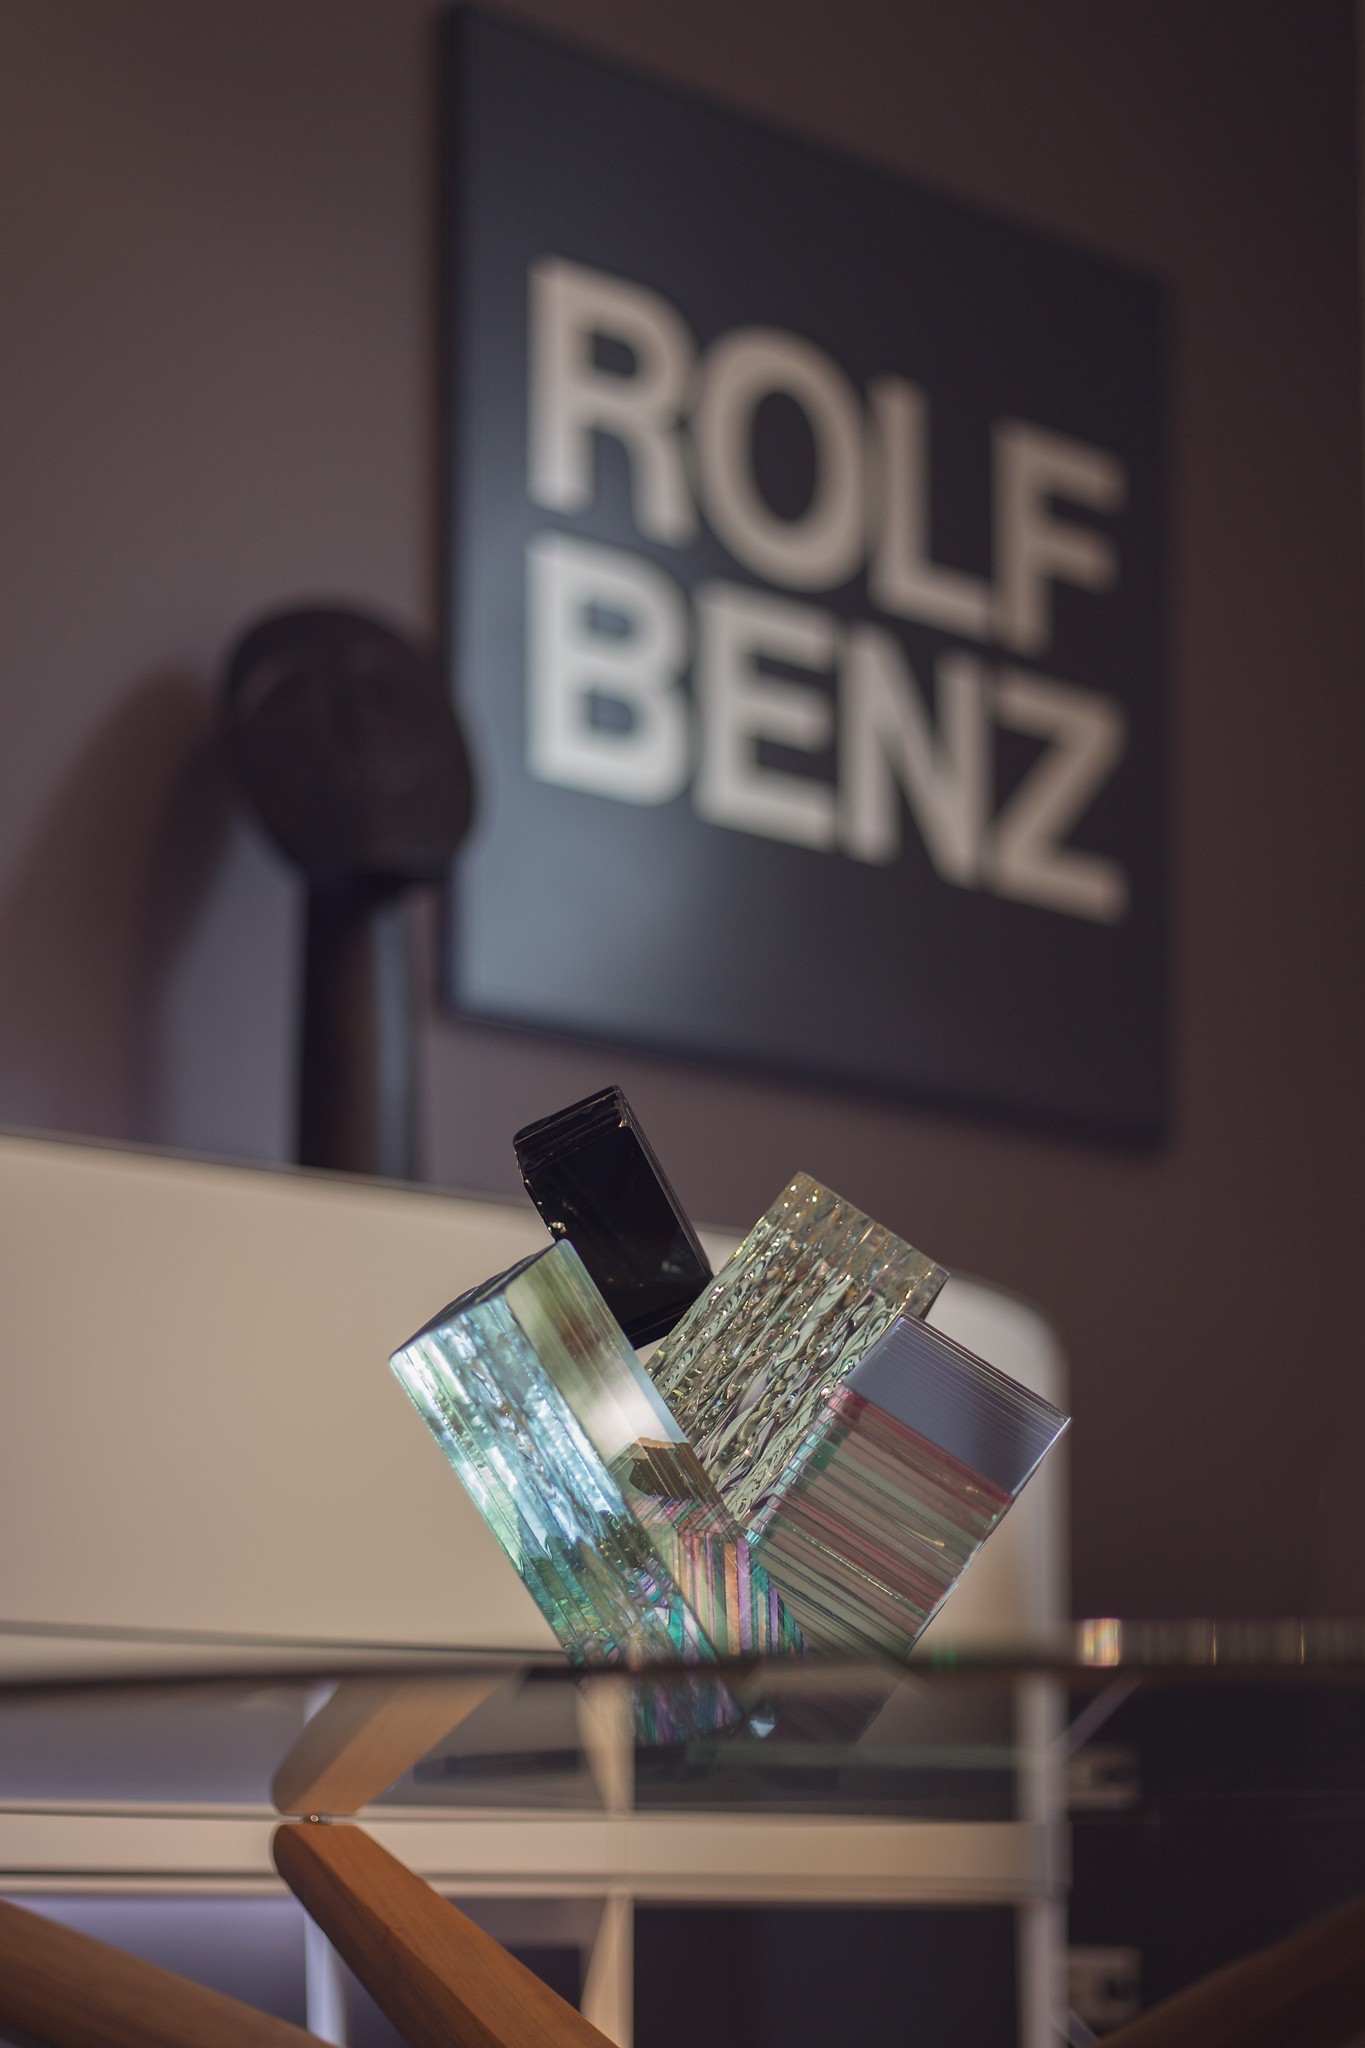 салон мебели в риге Rolf benz_ambergs_ э